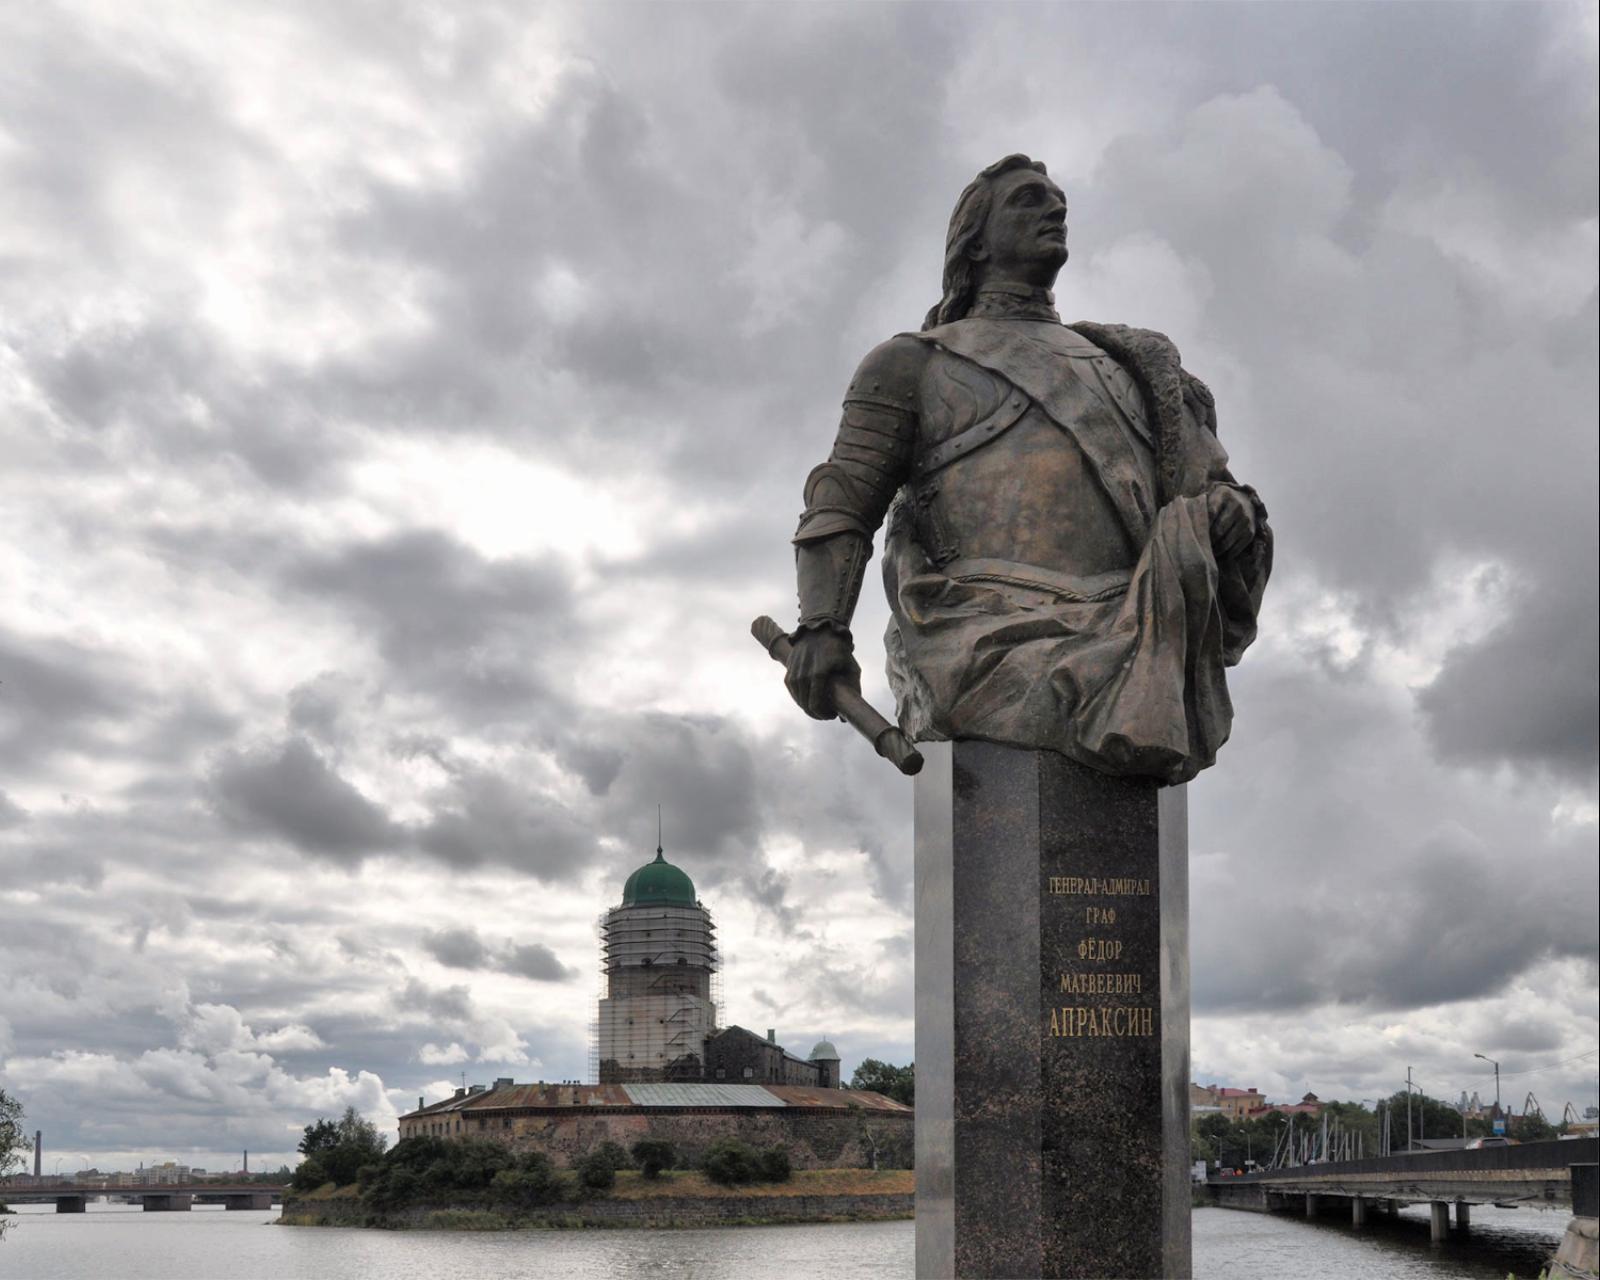 Фёдор Апраксин – адмирал Петра Великого история